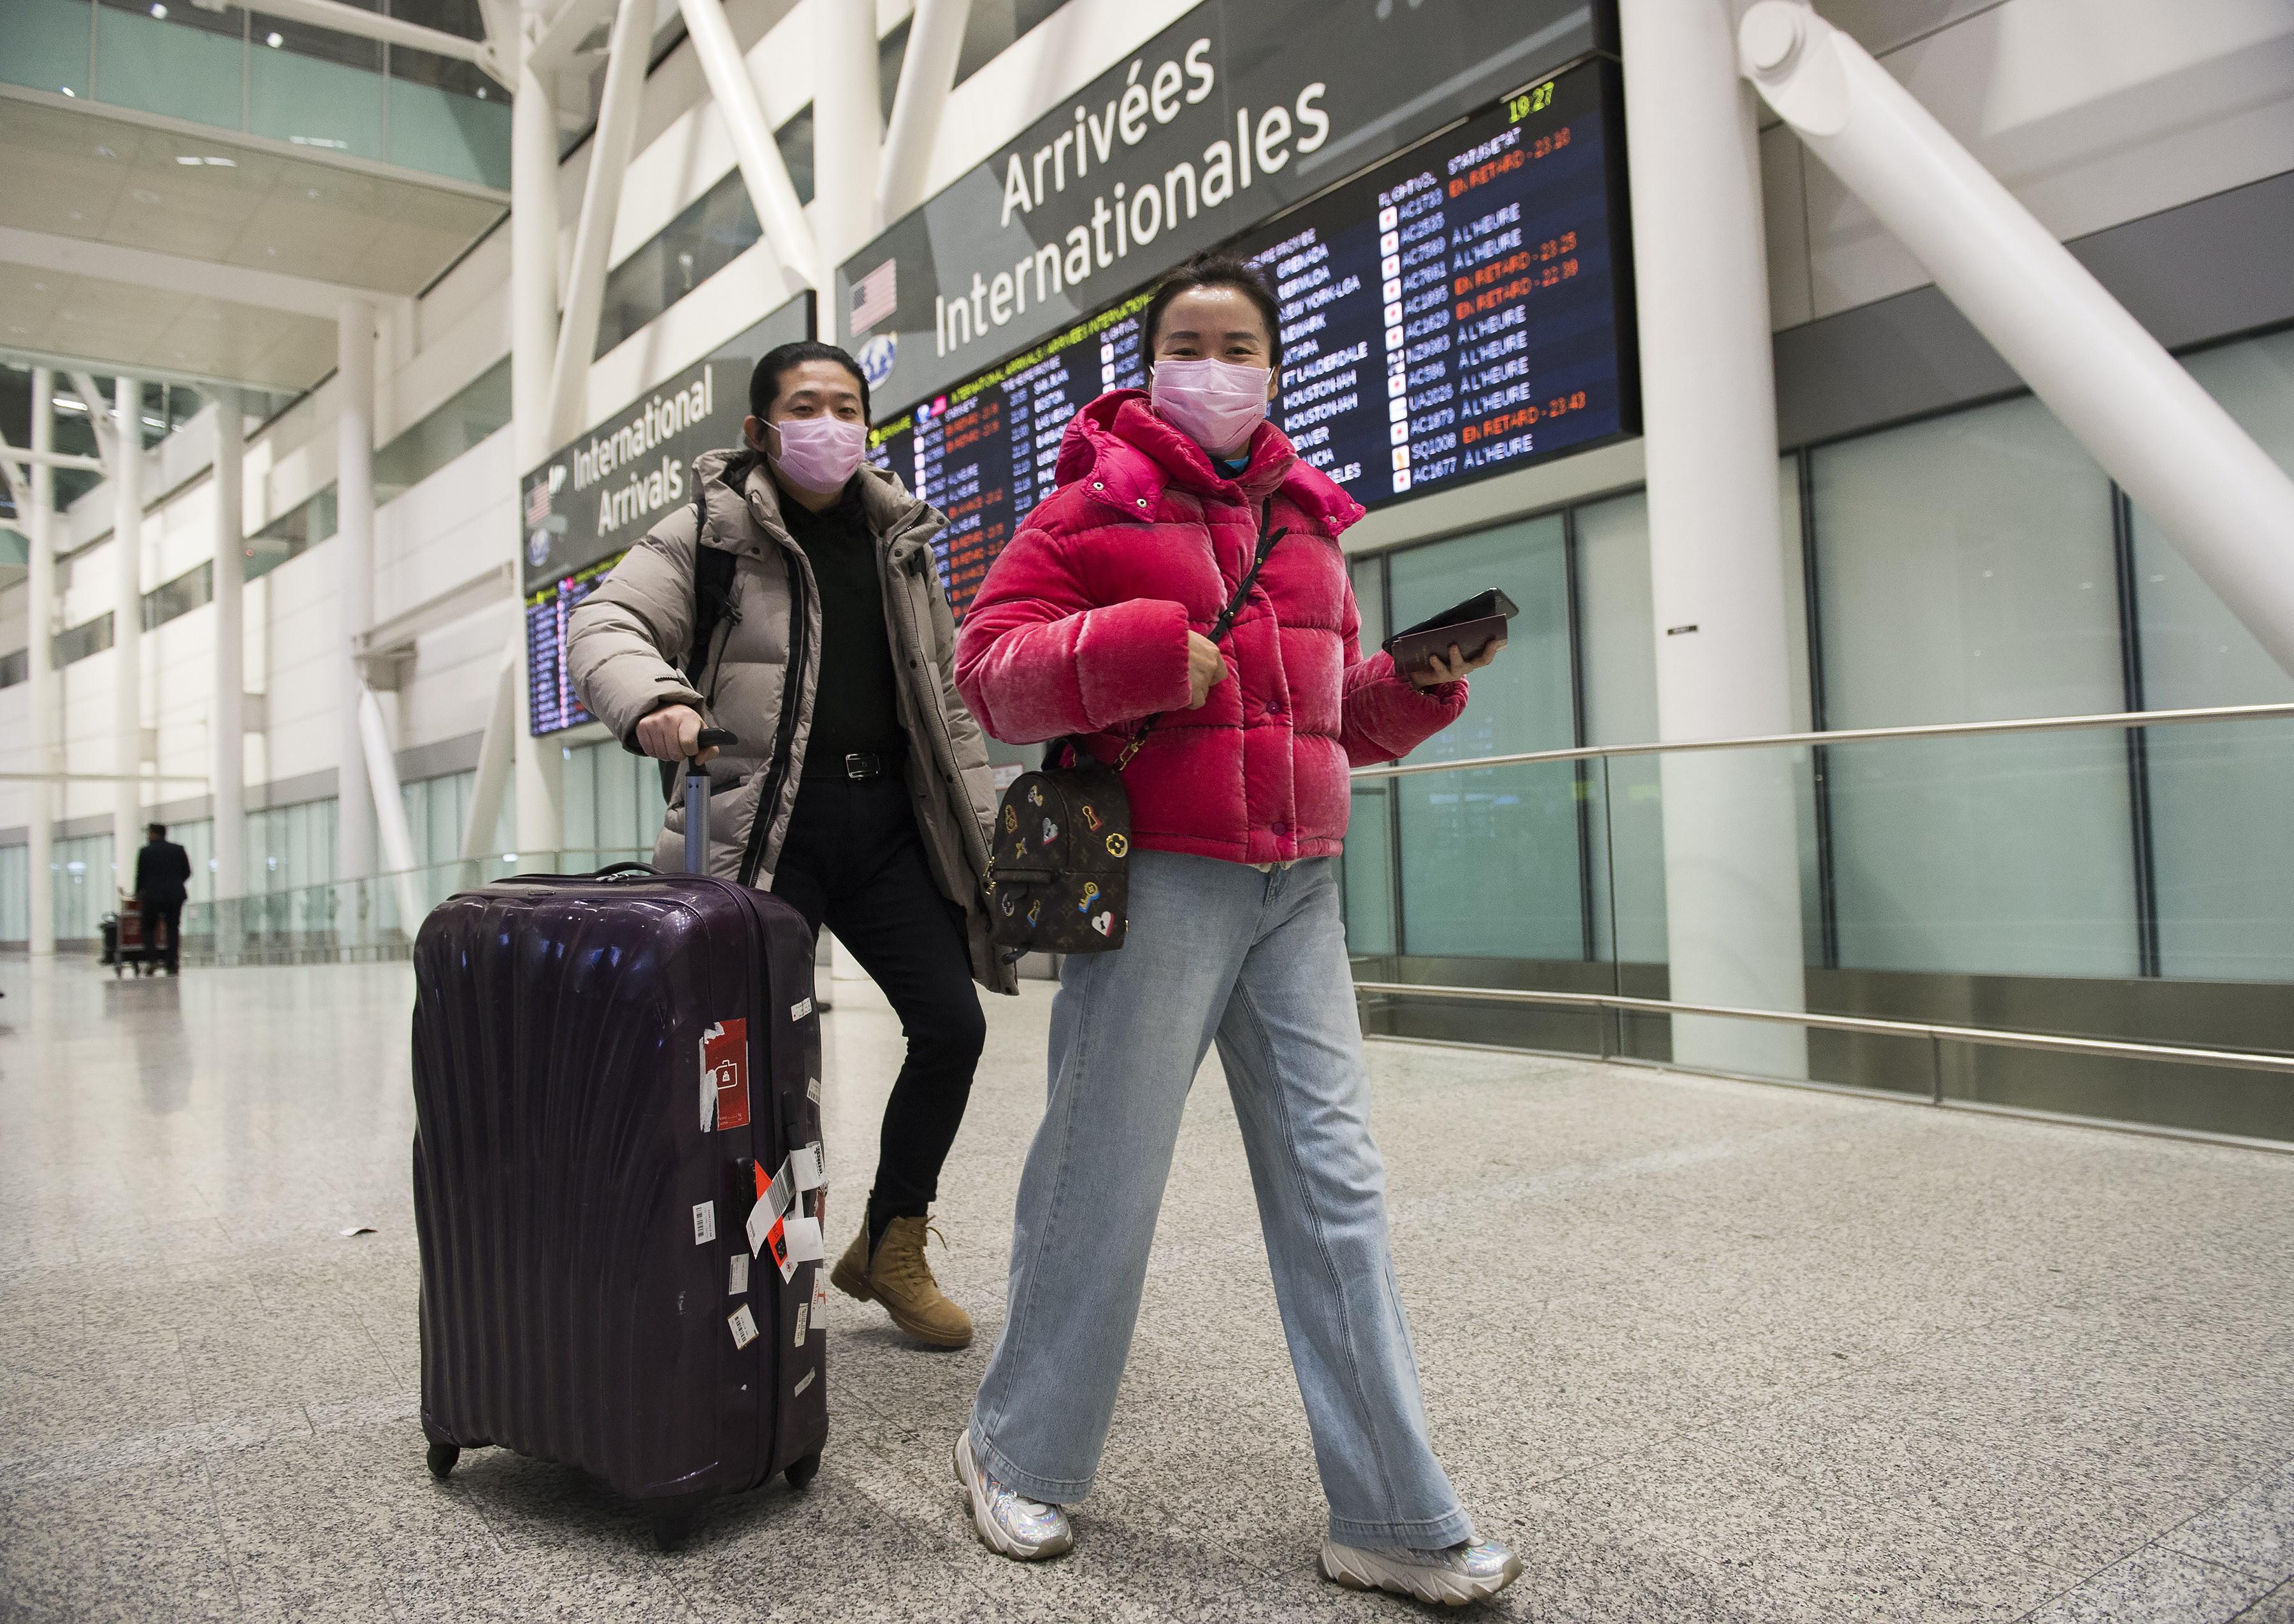 Ontario coronavirus patient showed mild symptoms on flight